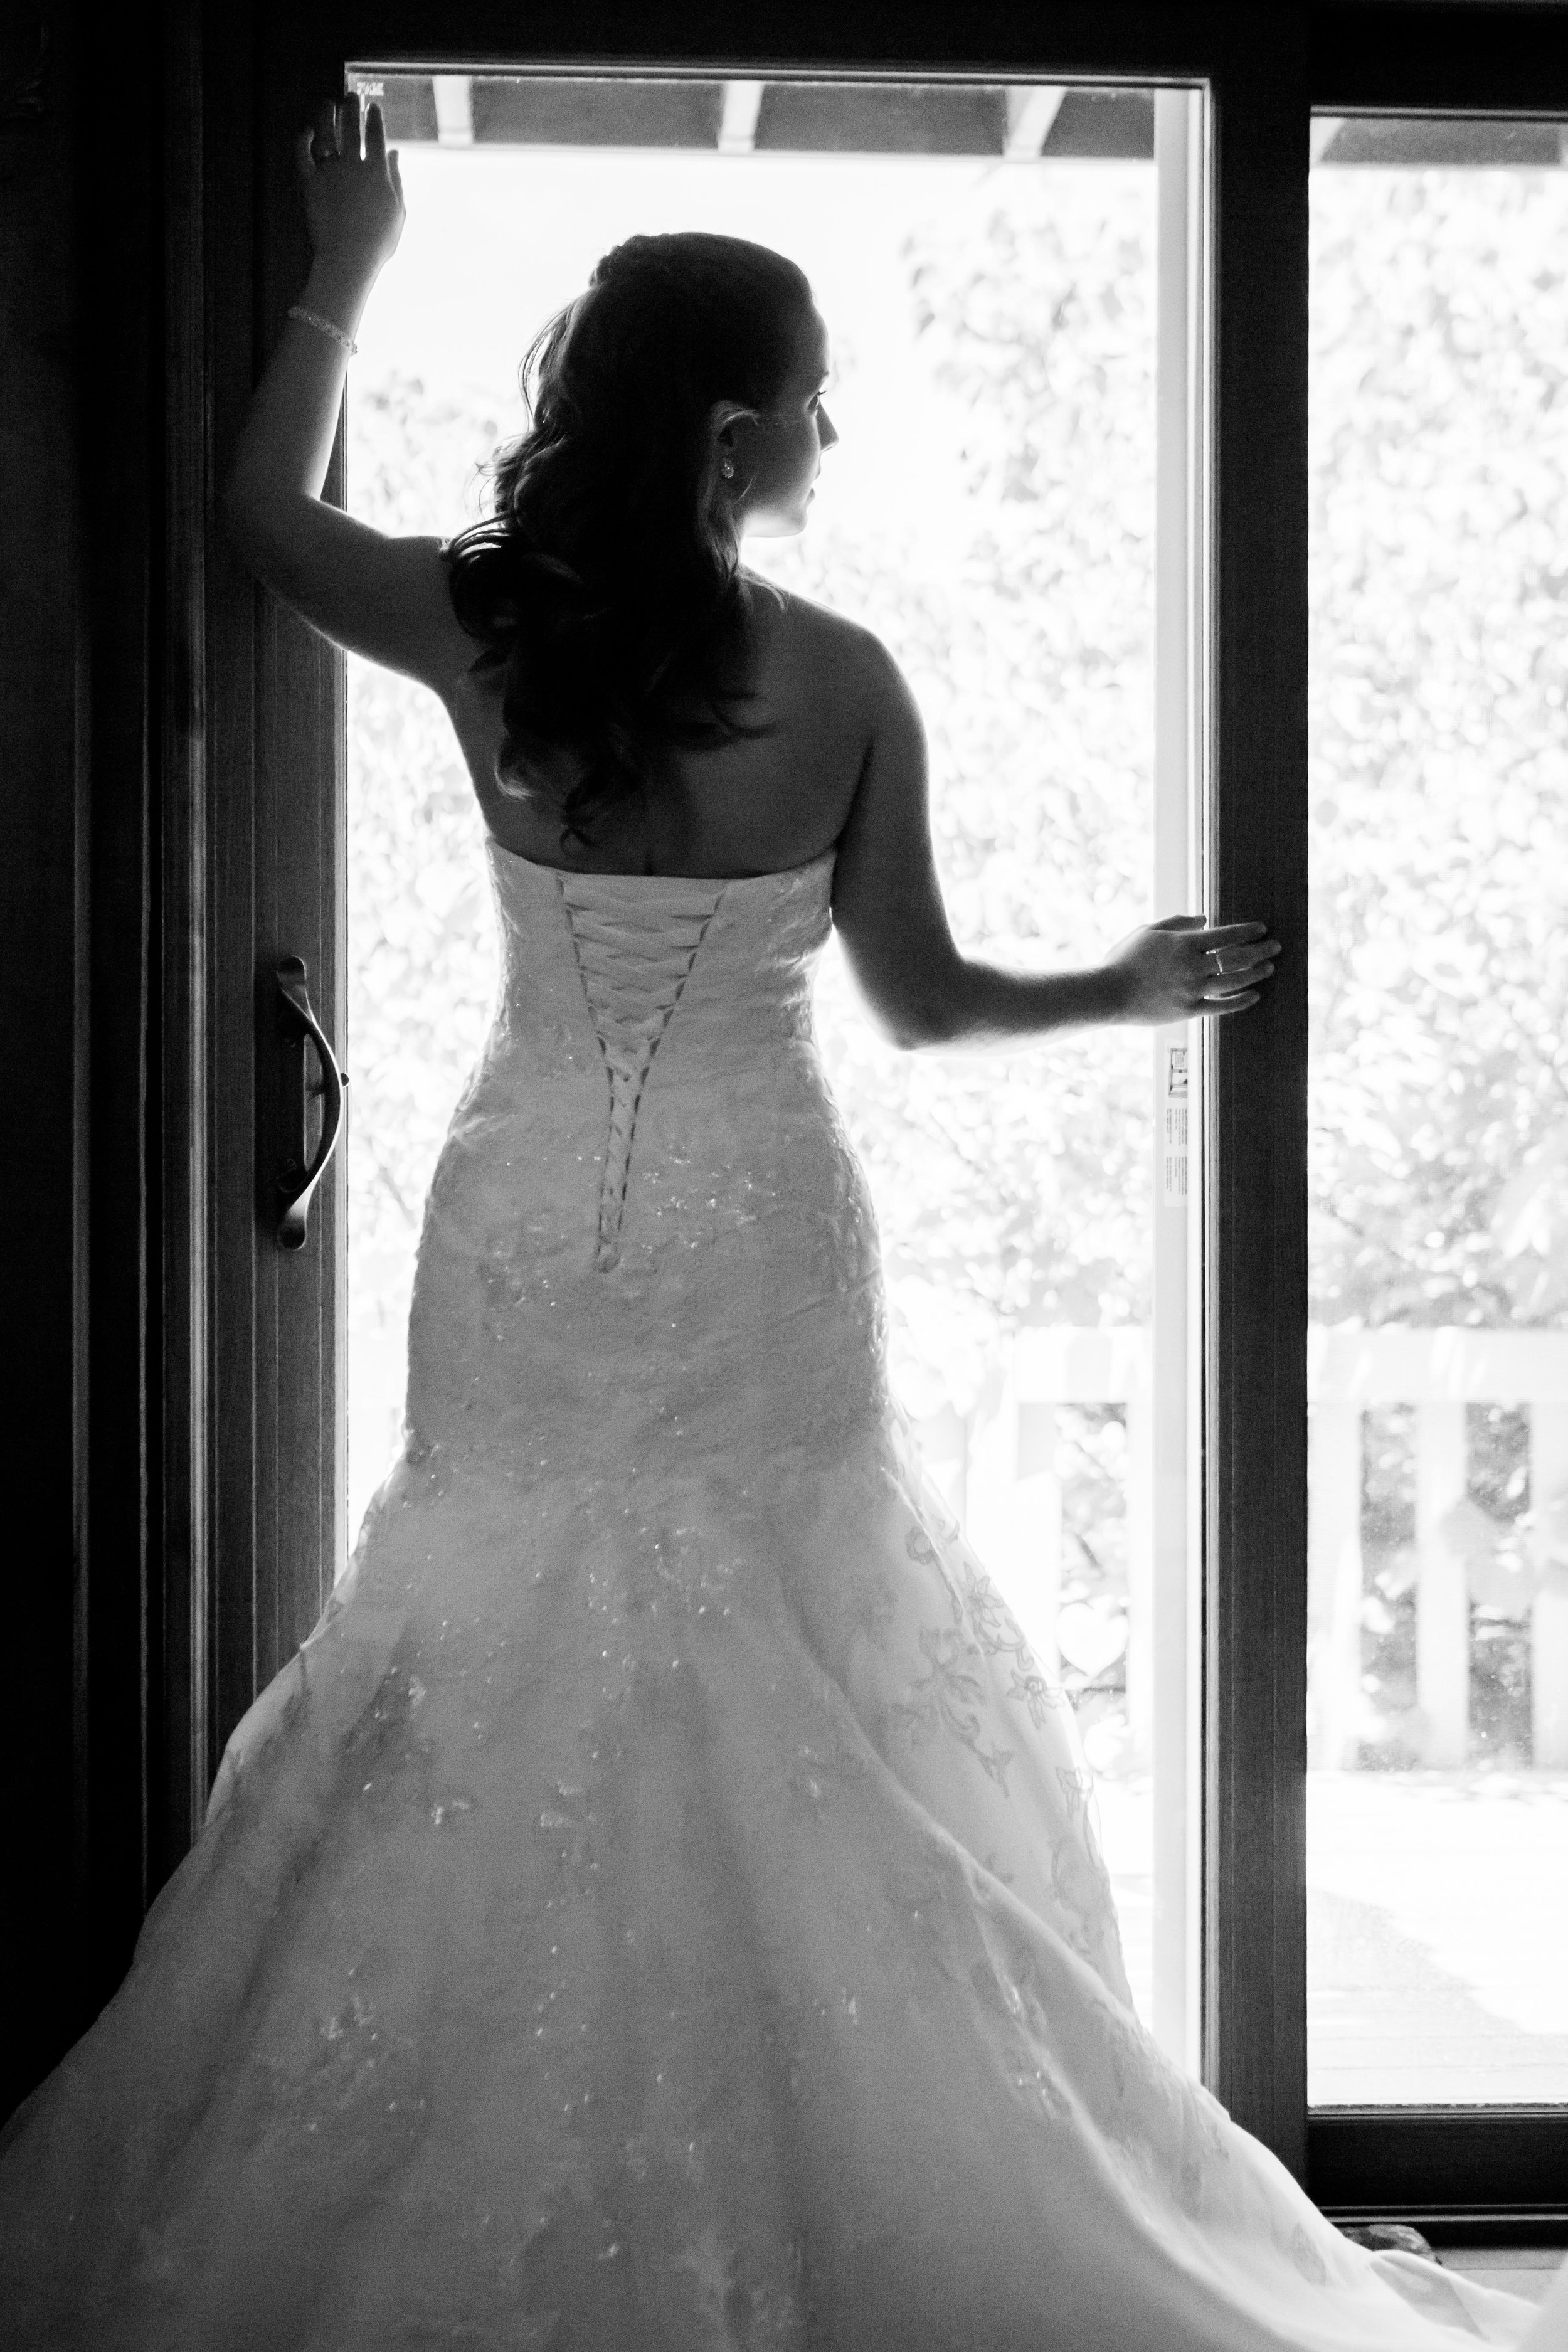 060416_Norris_Smith_Wedding_CF_1343.jpg